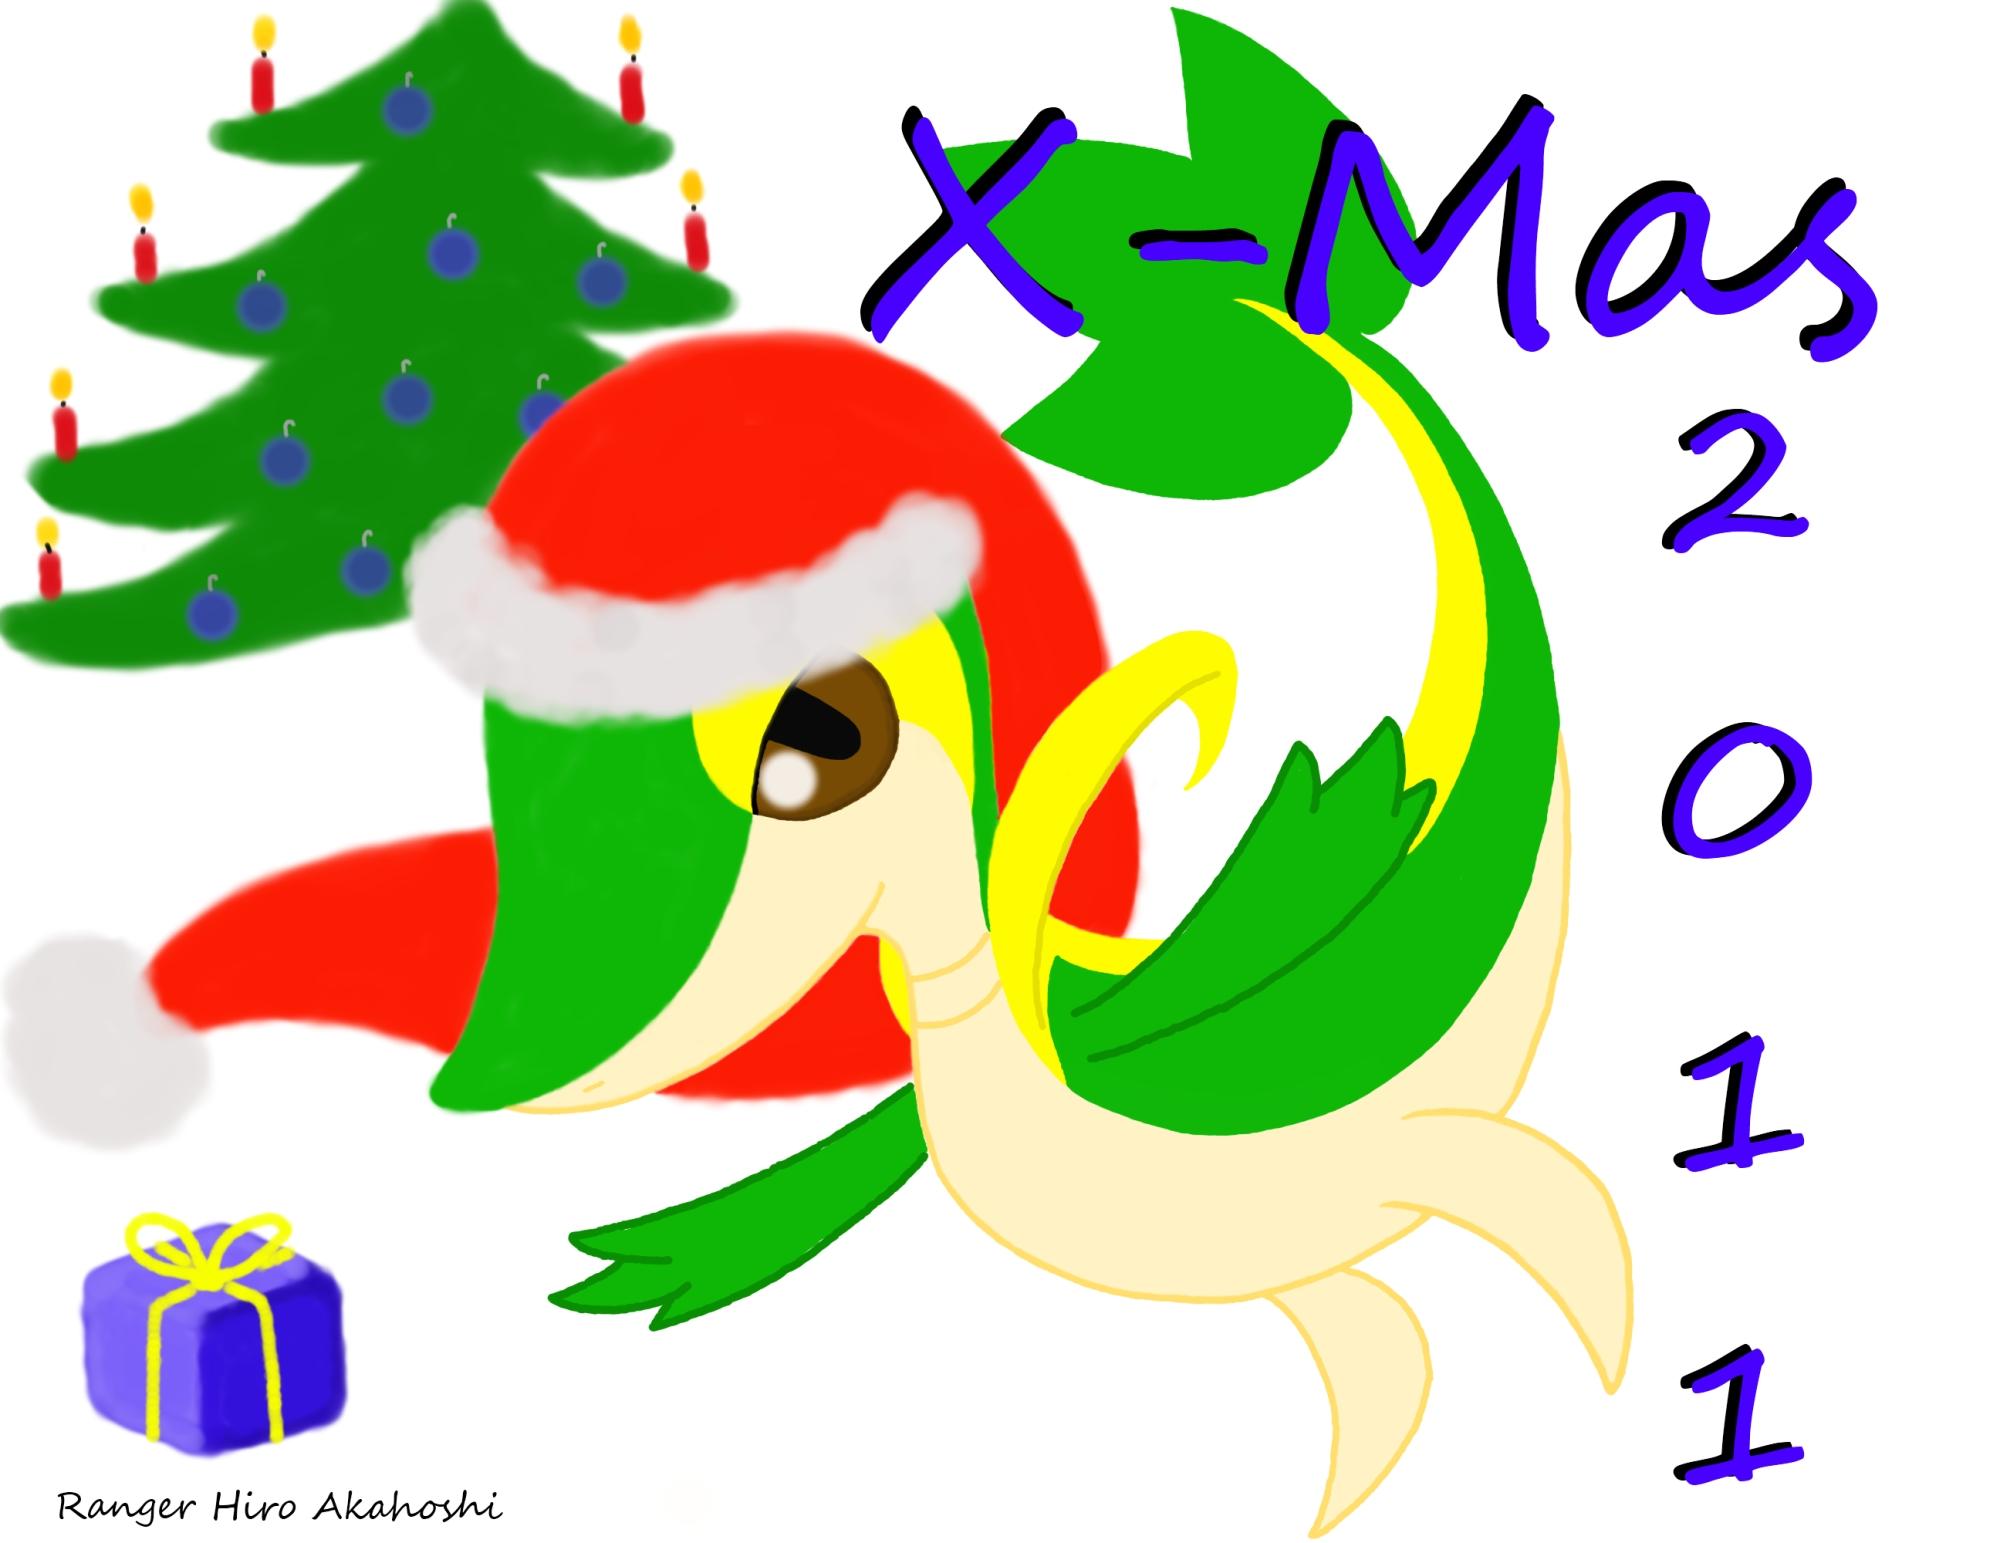 Pokémon-Zeichnung: X-Mas 2011